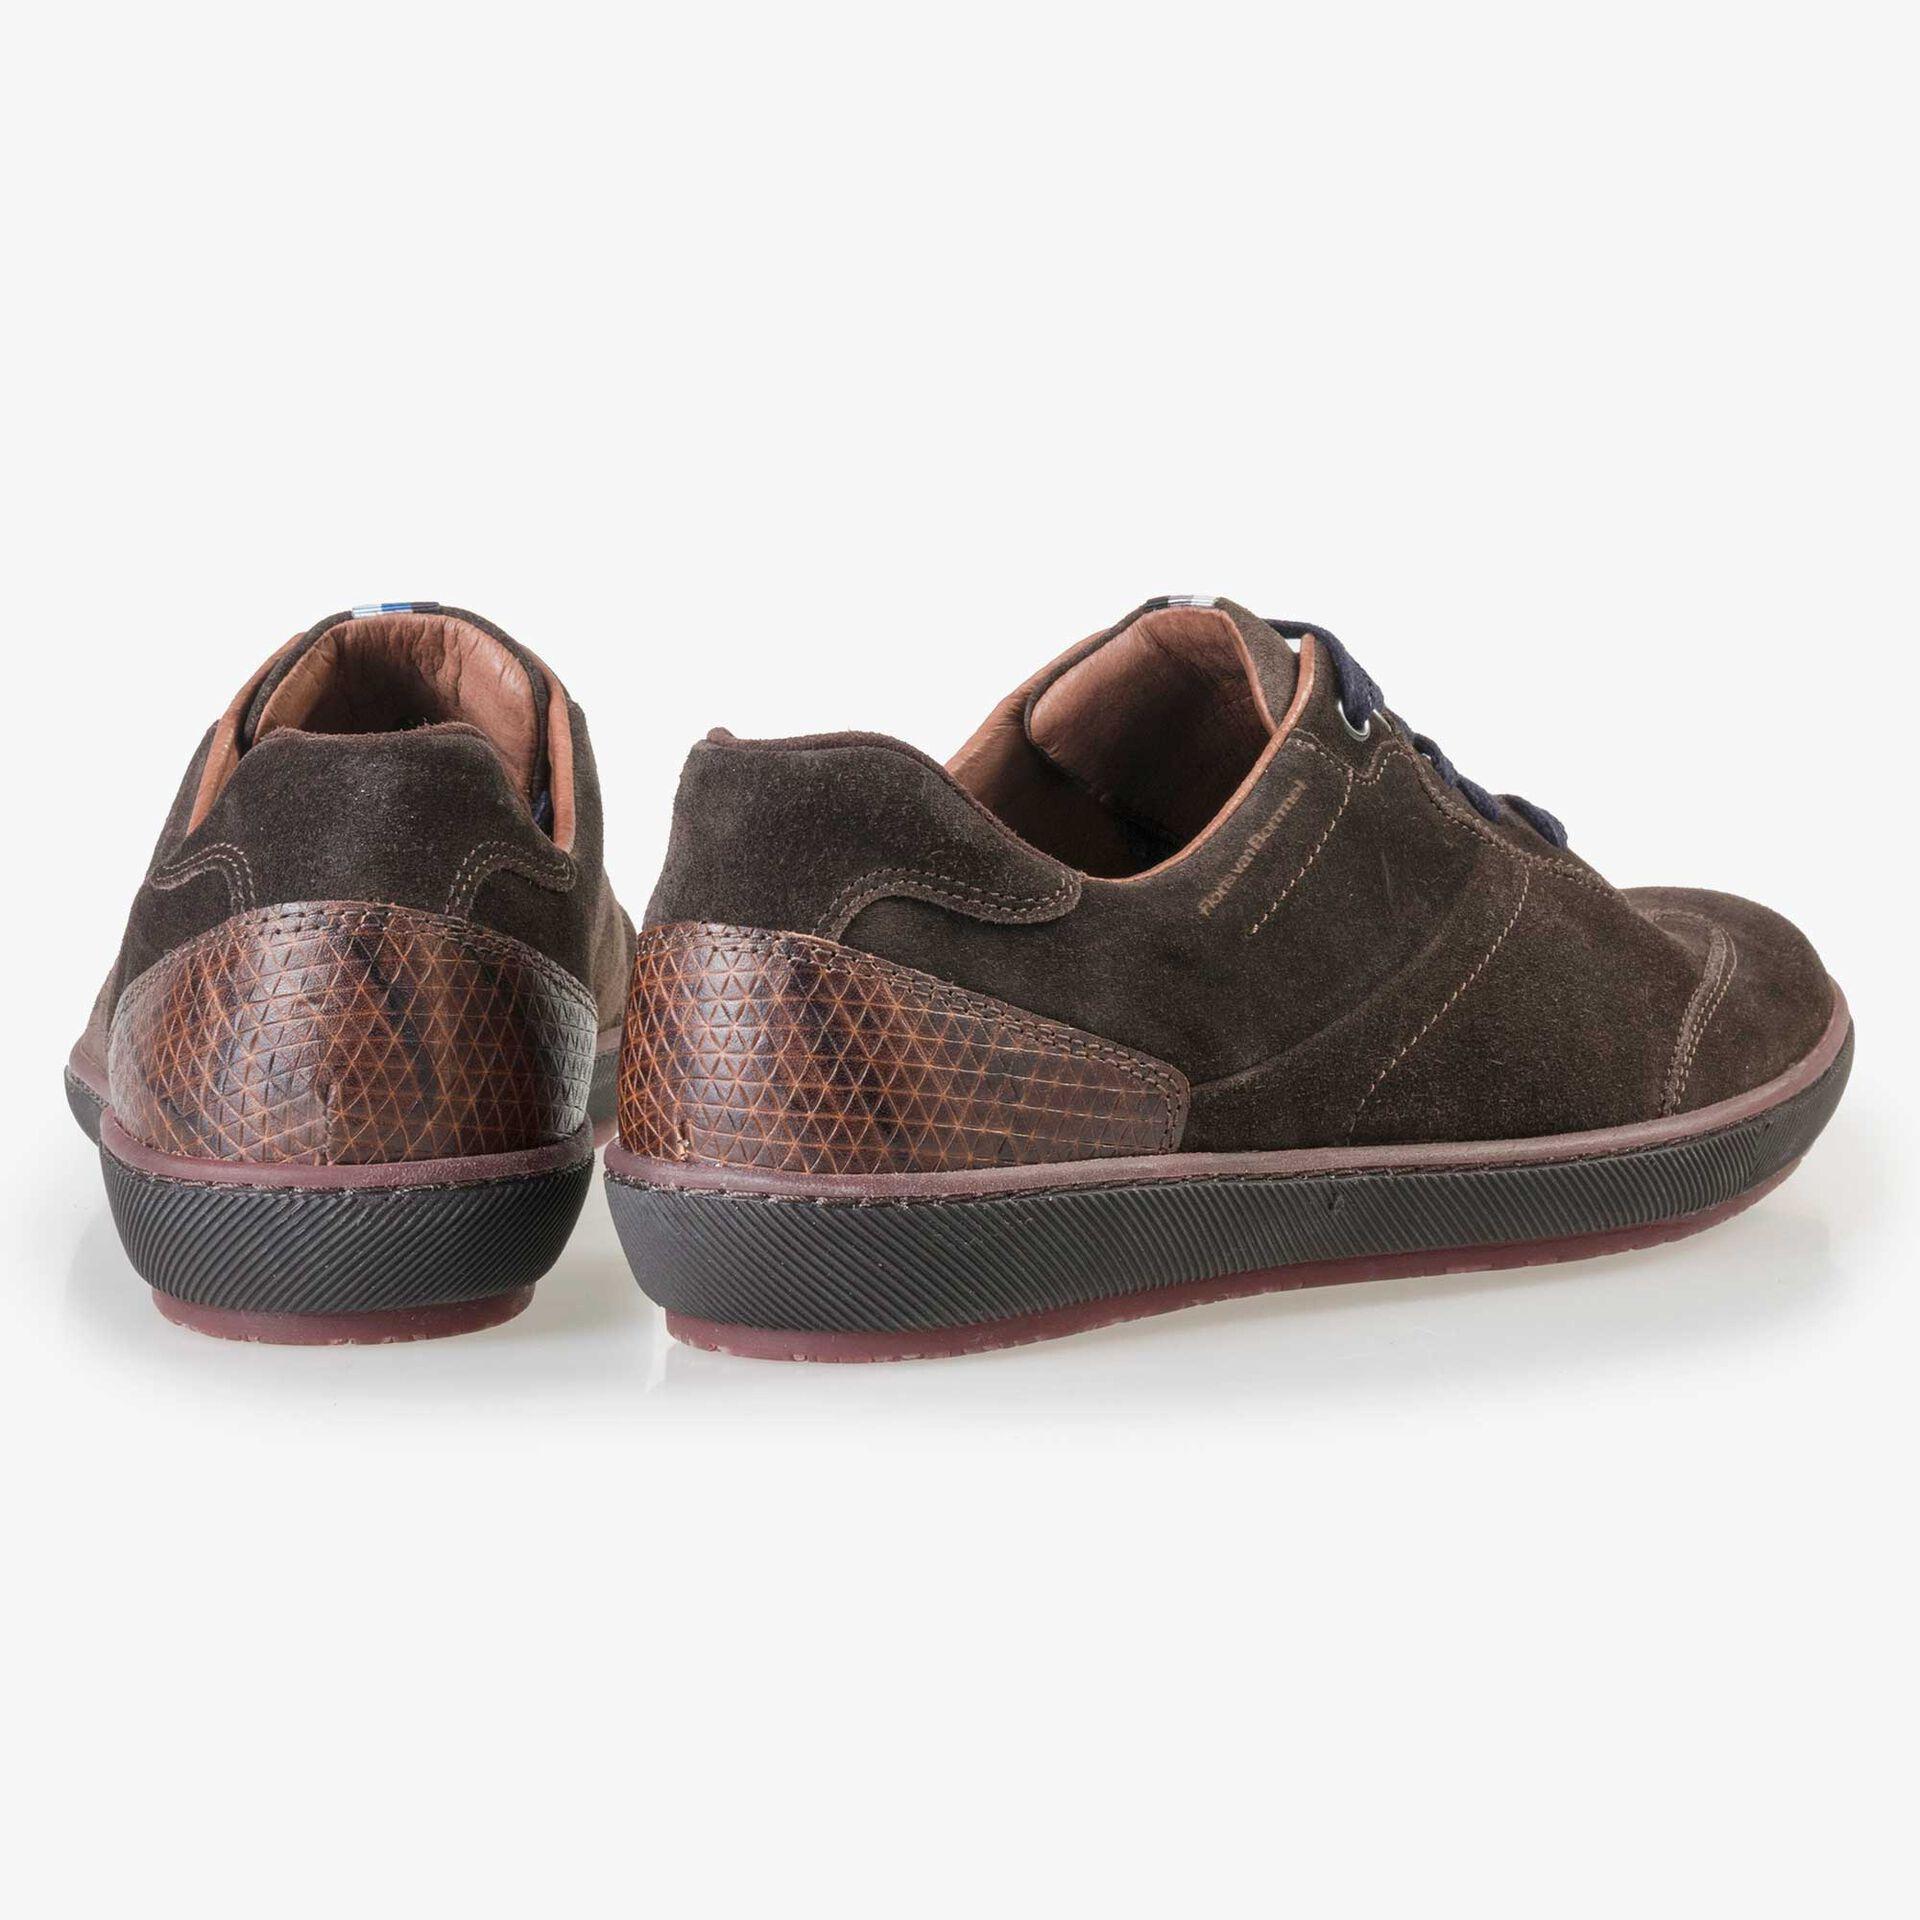 Floris van Bommel men's brown suede leather sneaker